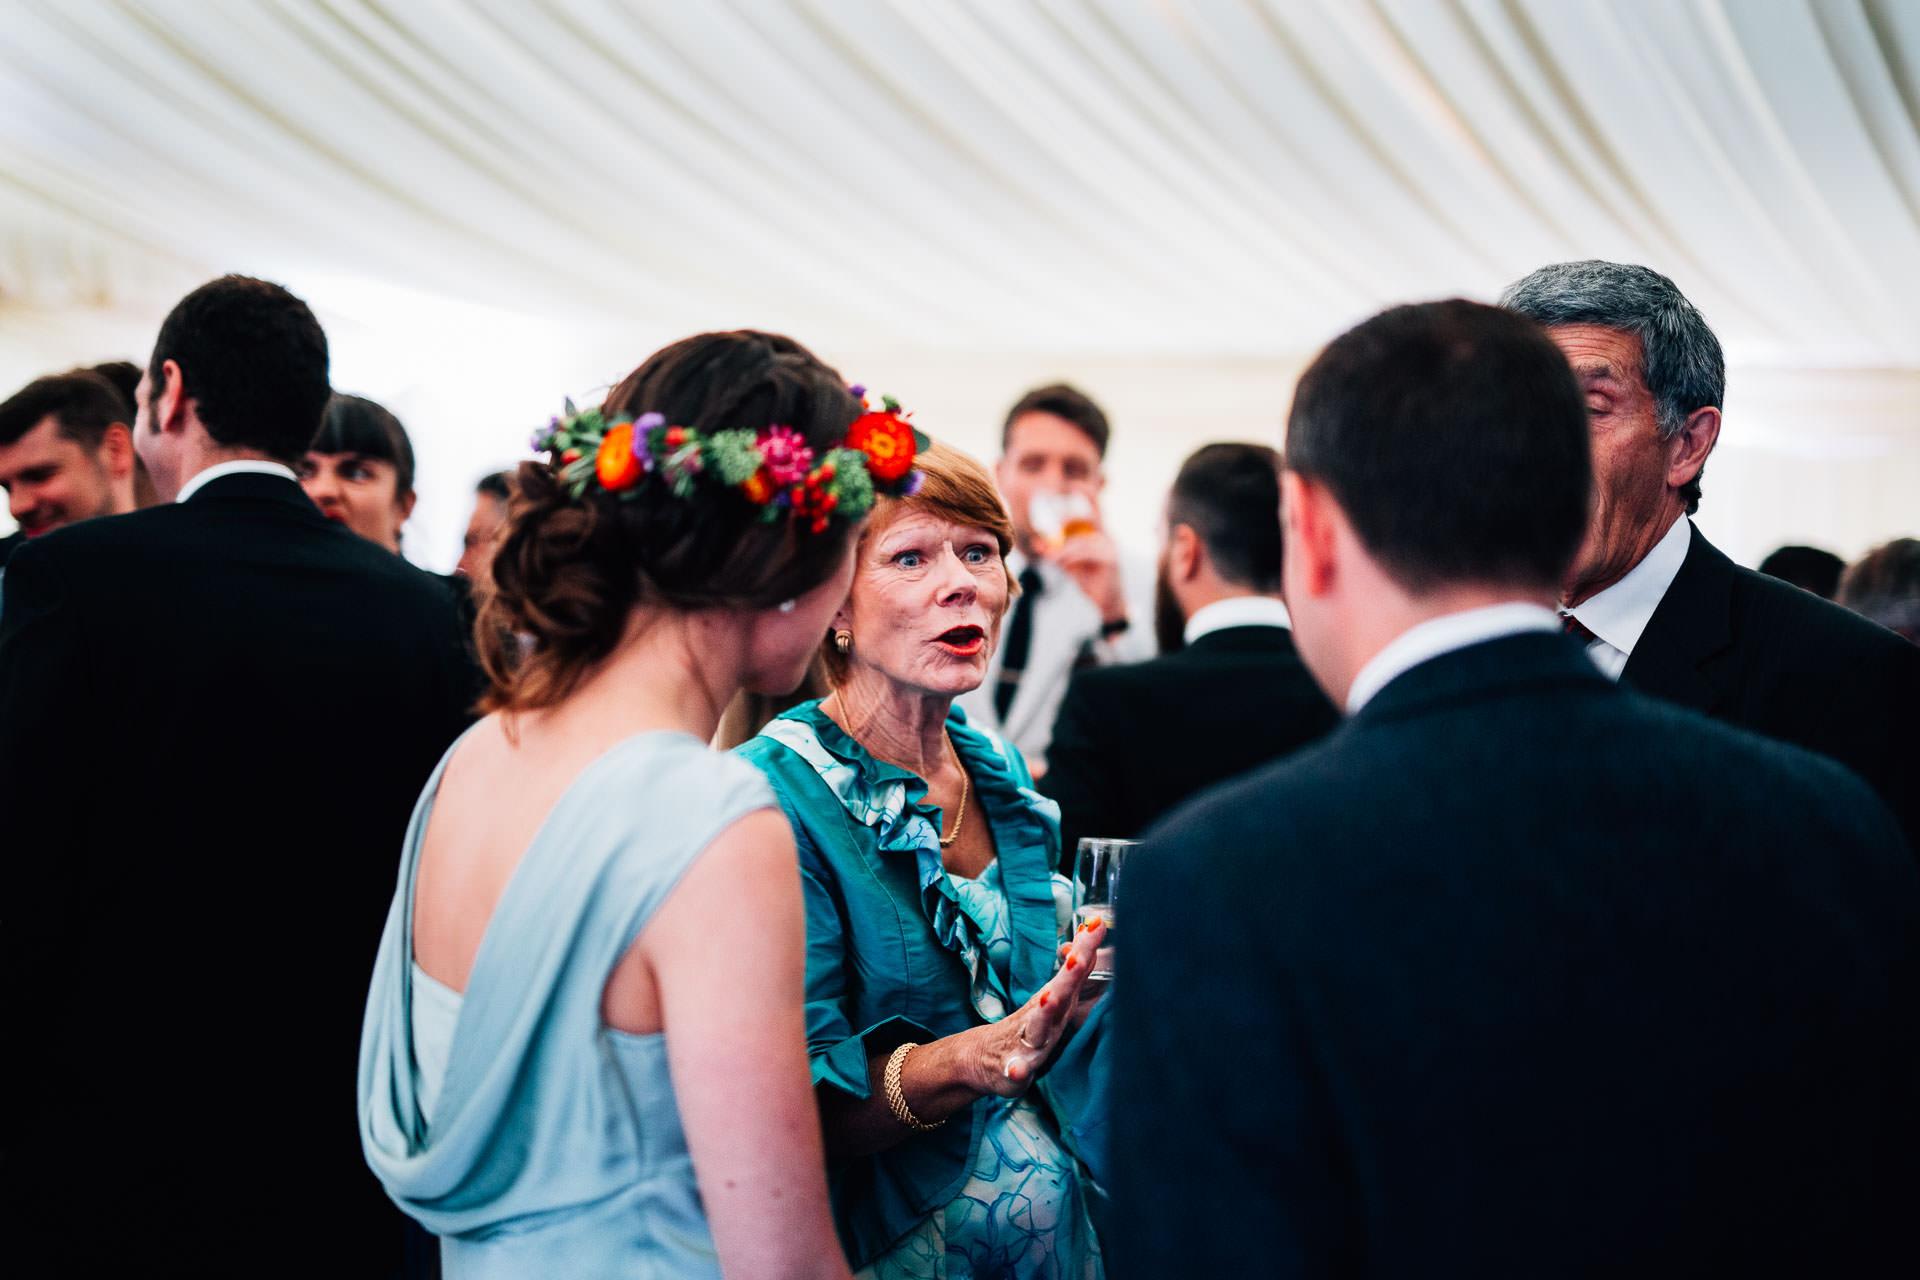 winterbourne-medieval-barn-wedding-photography-emma-andrew-109